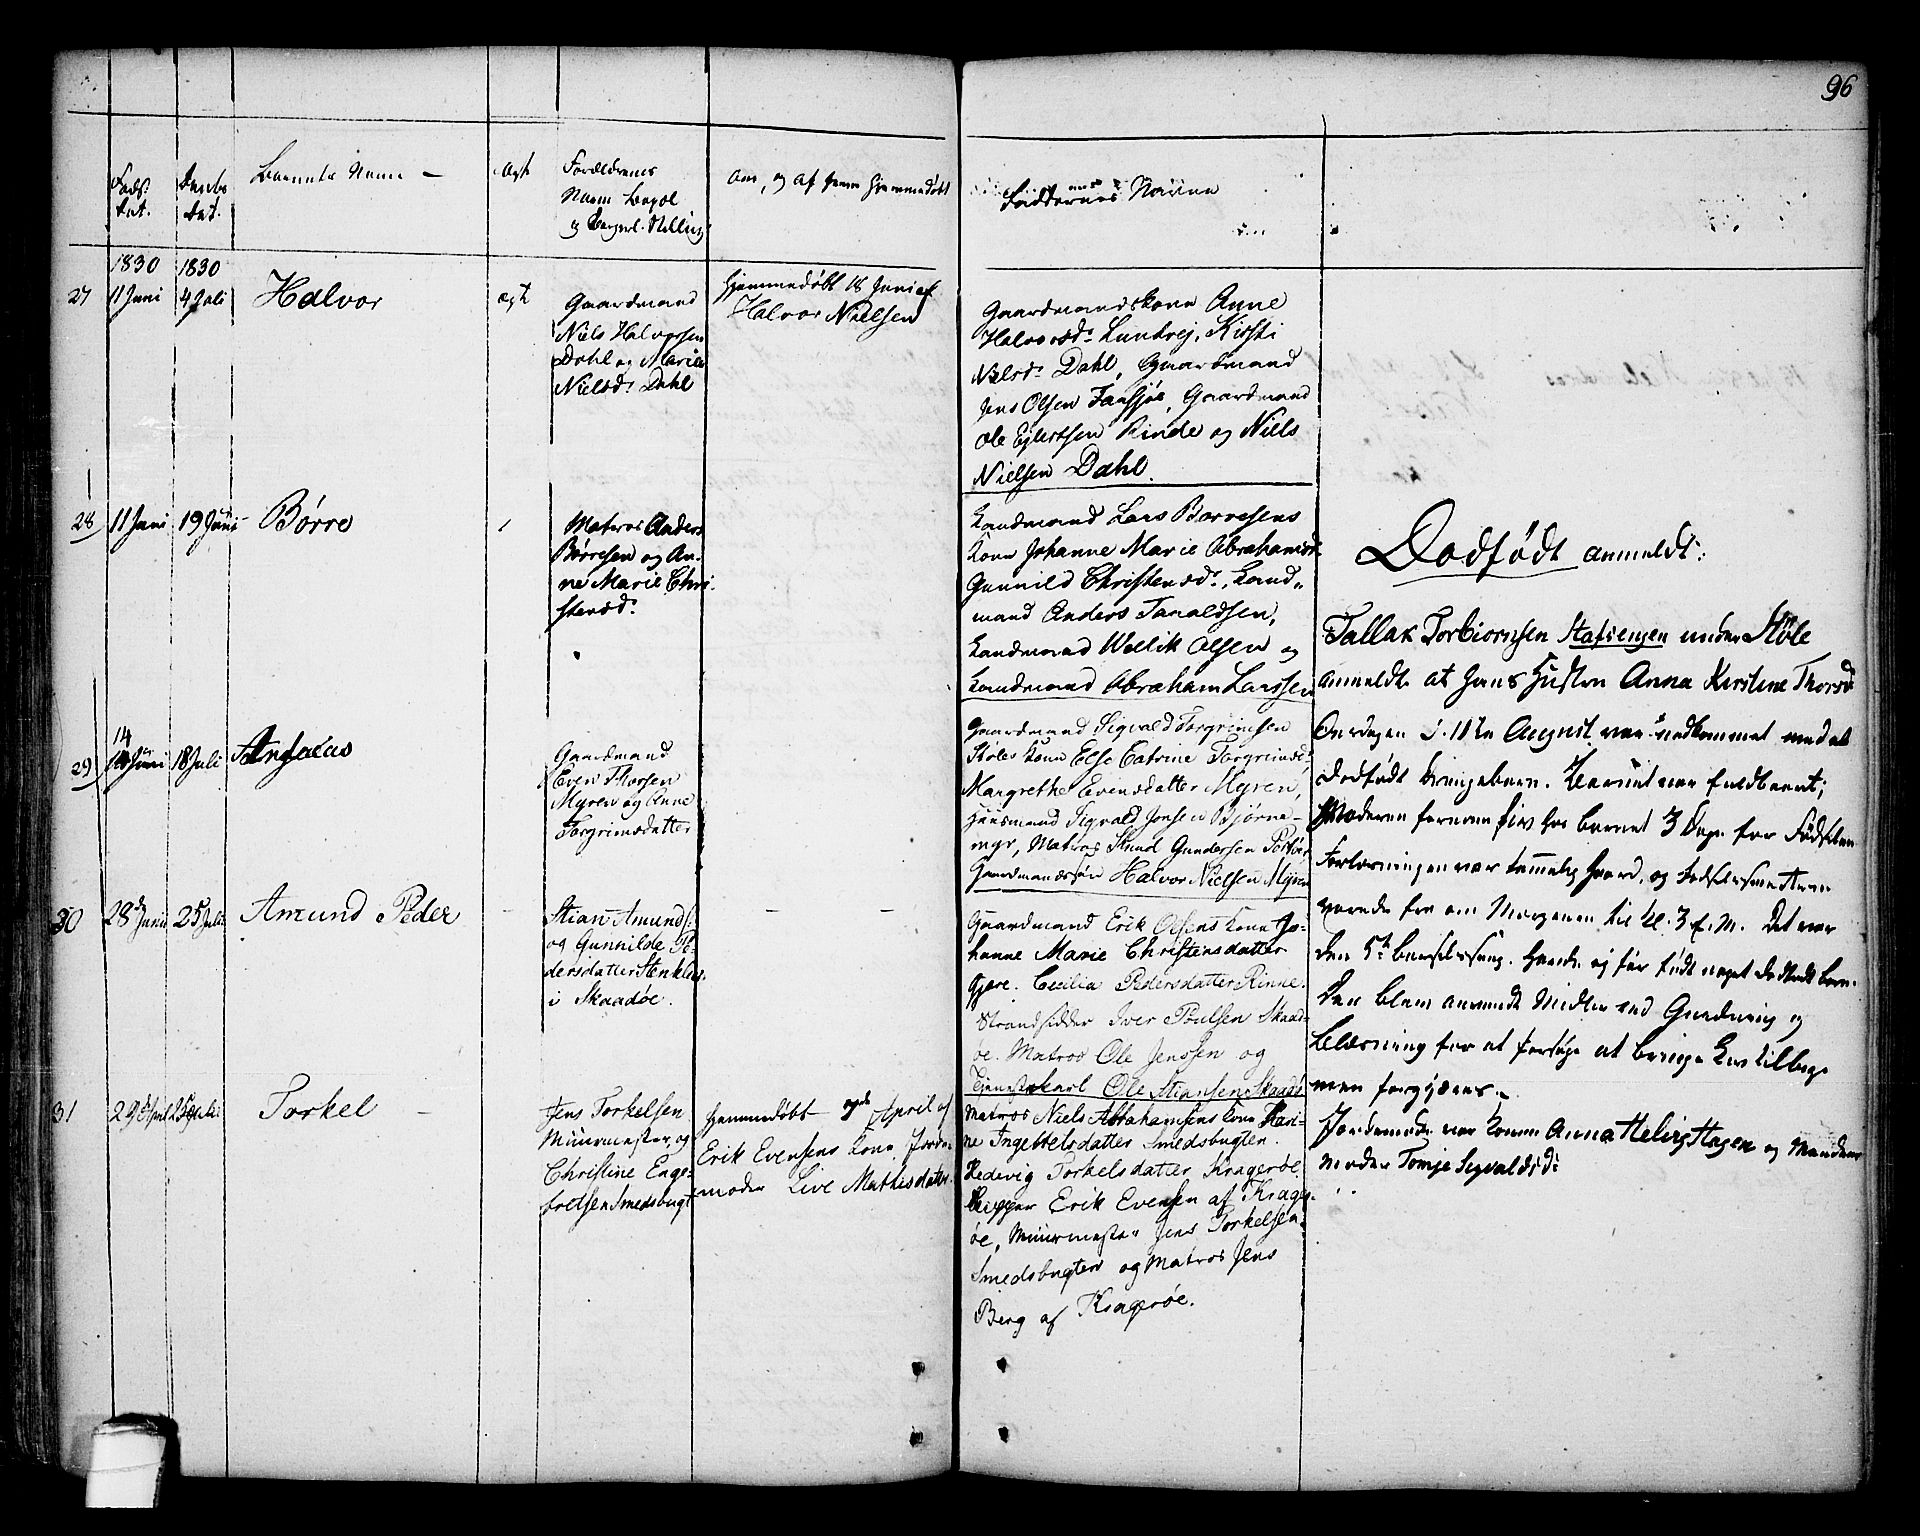 SAKO, Kragerø kirkebøker, F/Fa/L0002: Ministerialbok nr. 2, 1767-1802, s. 96